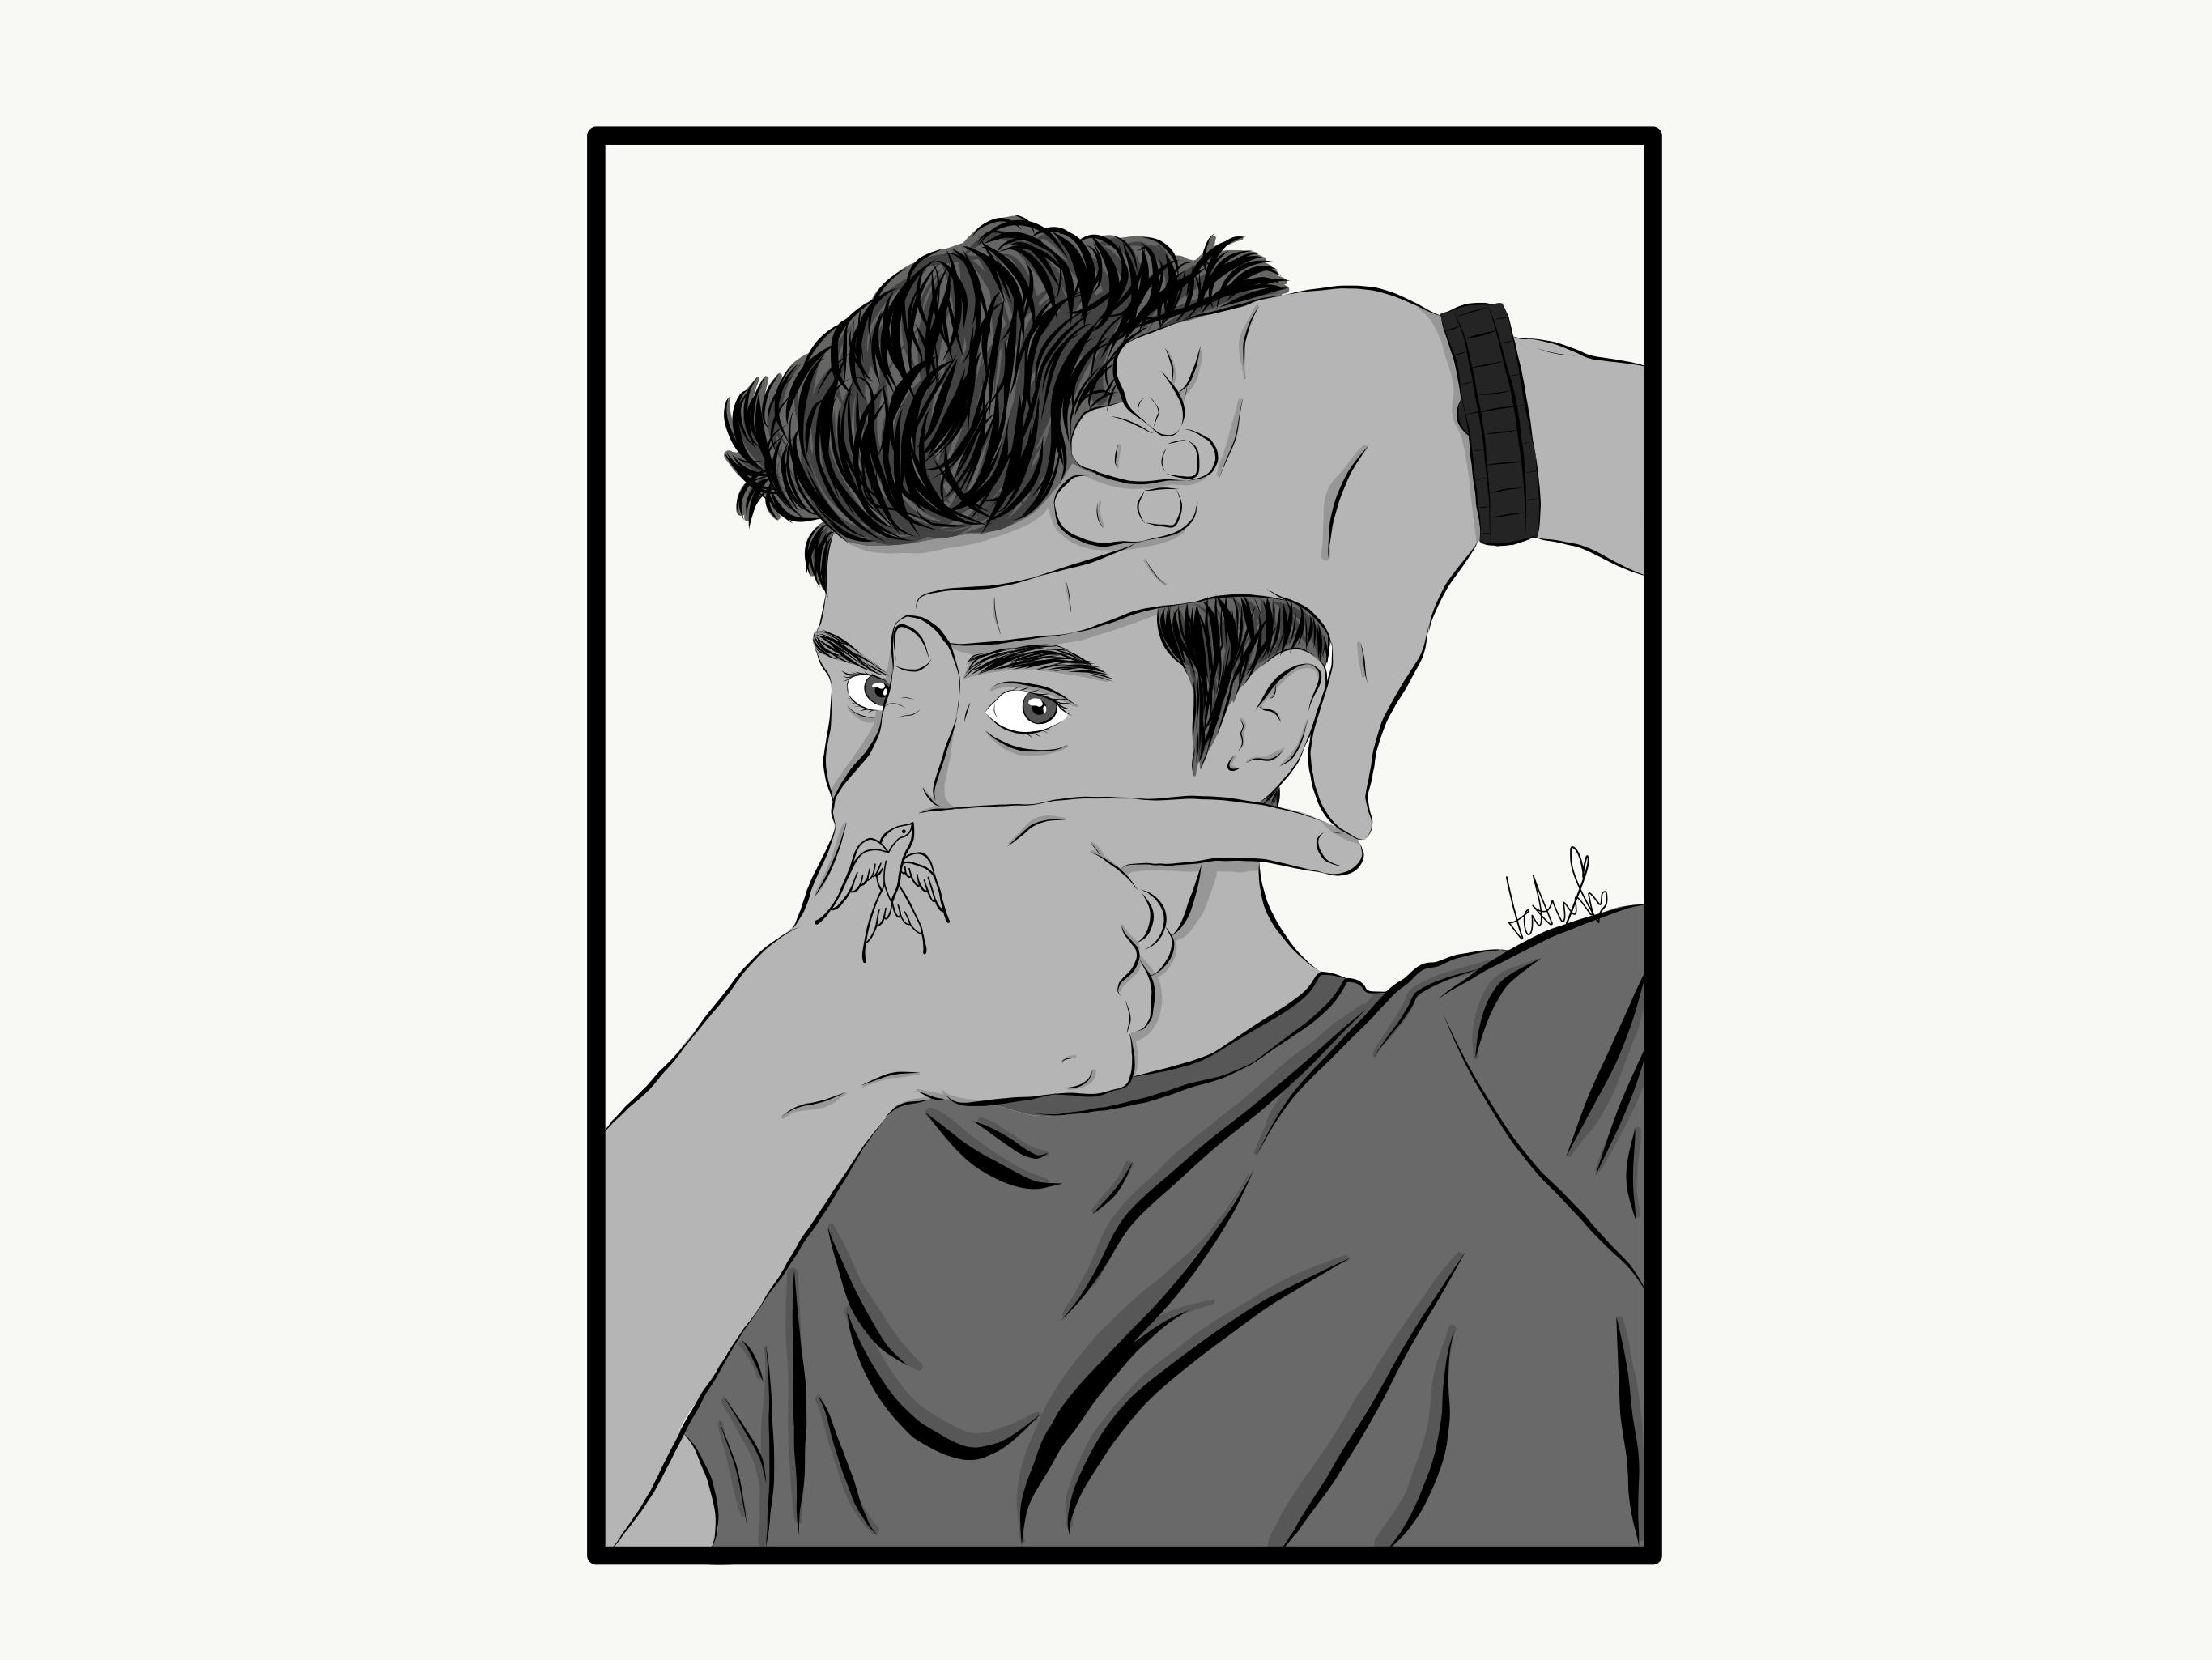 Shawn Mendes Cartoon Cartoon Drawings Shawn Mendes Tattoos Shawn Mendes